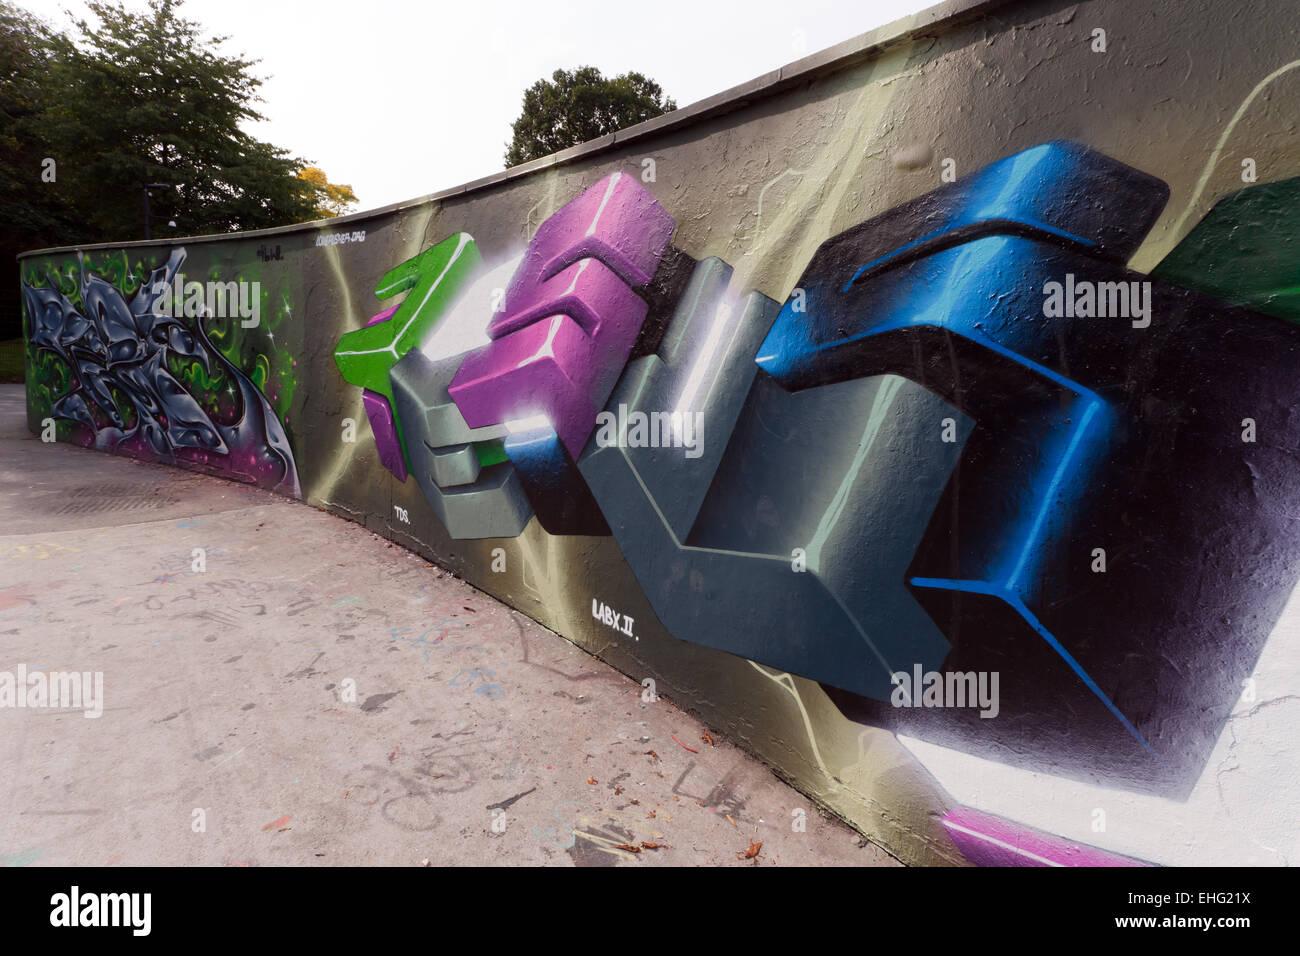 view of some Graffiti art, in the Skate-park,  Alaxandra Park, Haringey, London - Stock Image